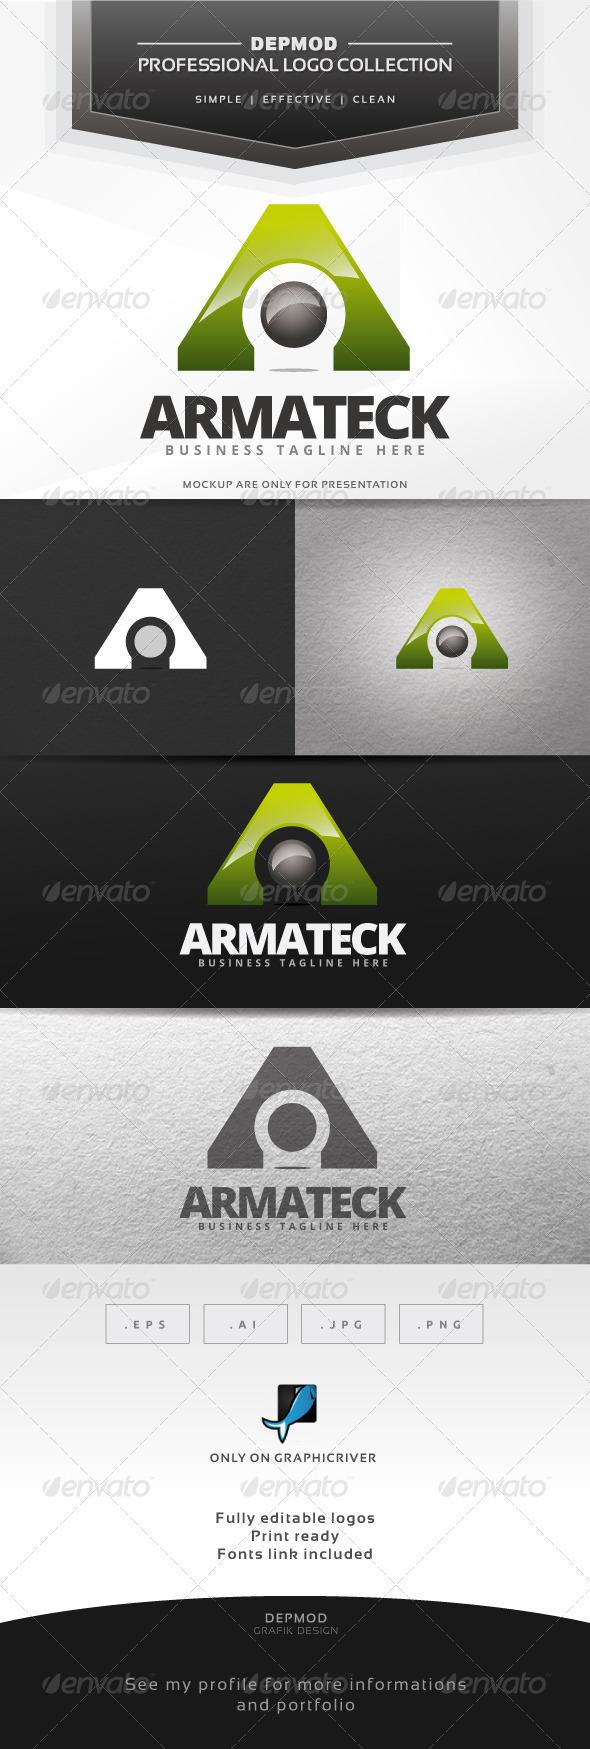 GraphicRiver Armateck Logo 7140649